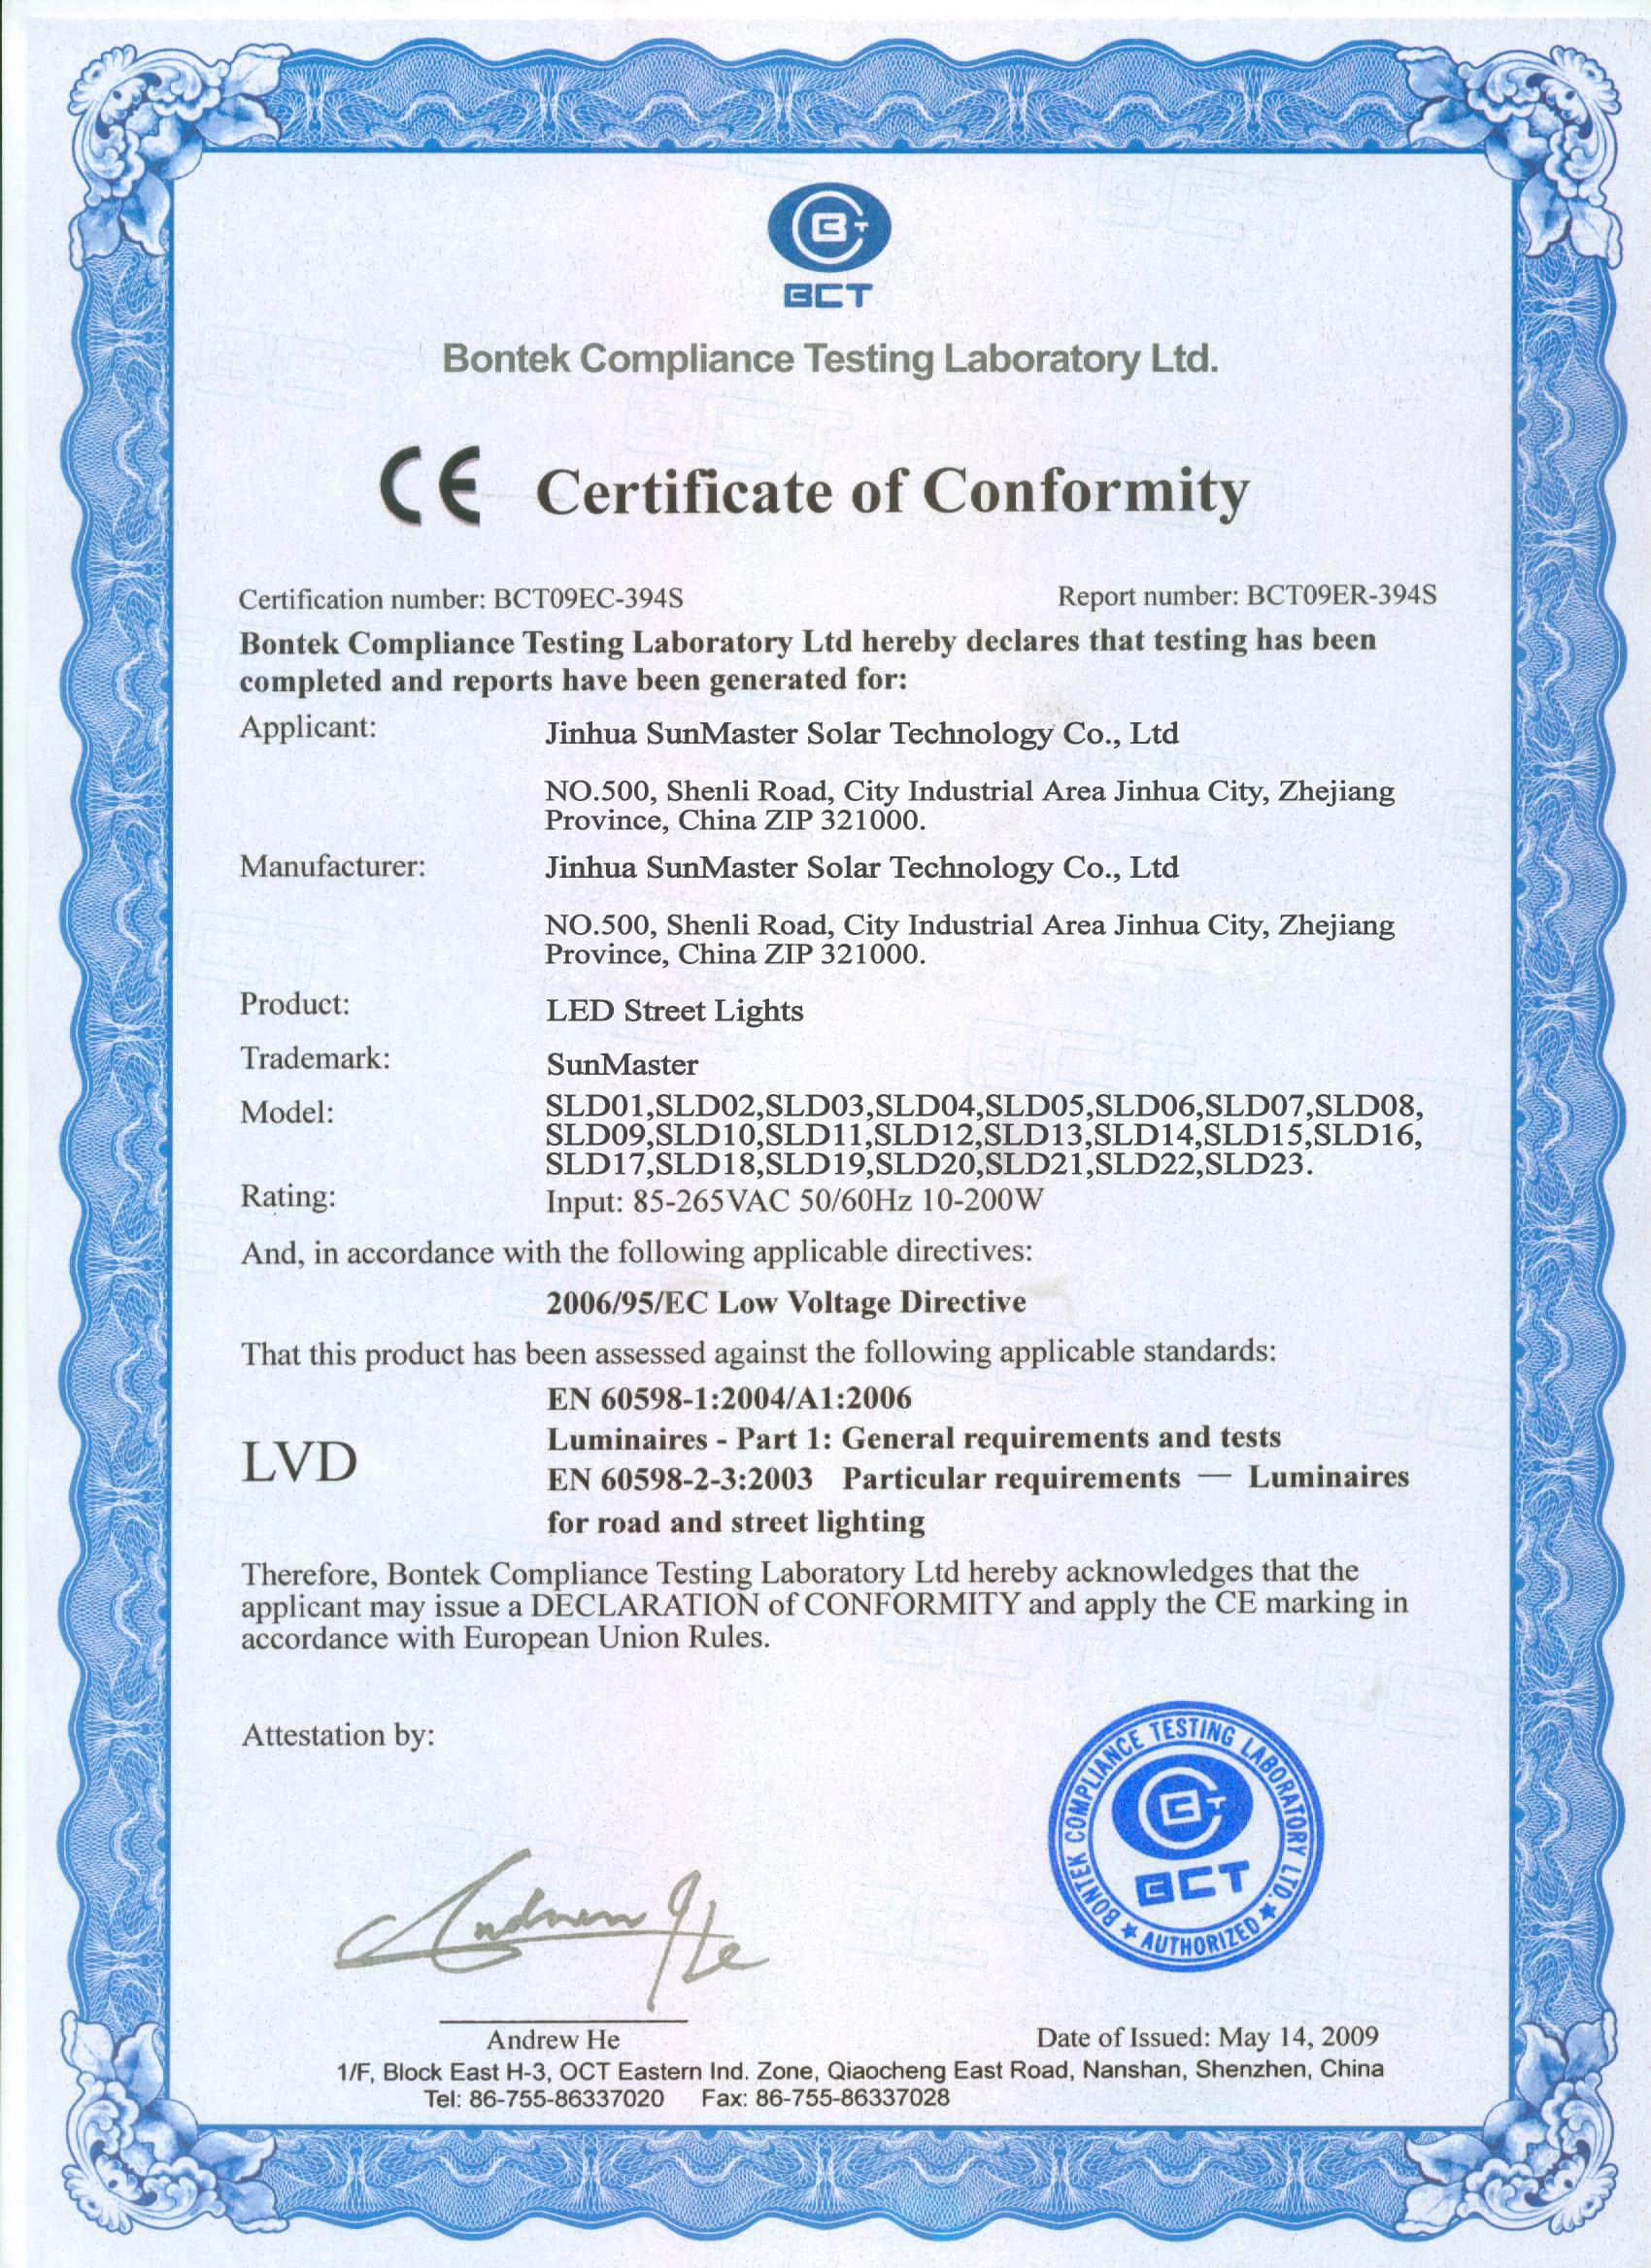 03-CELVD-Of-LED-Street-Lights Certificados Sistemas de Iluminación Solar SunMaster